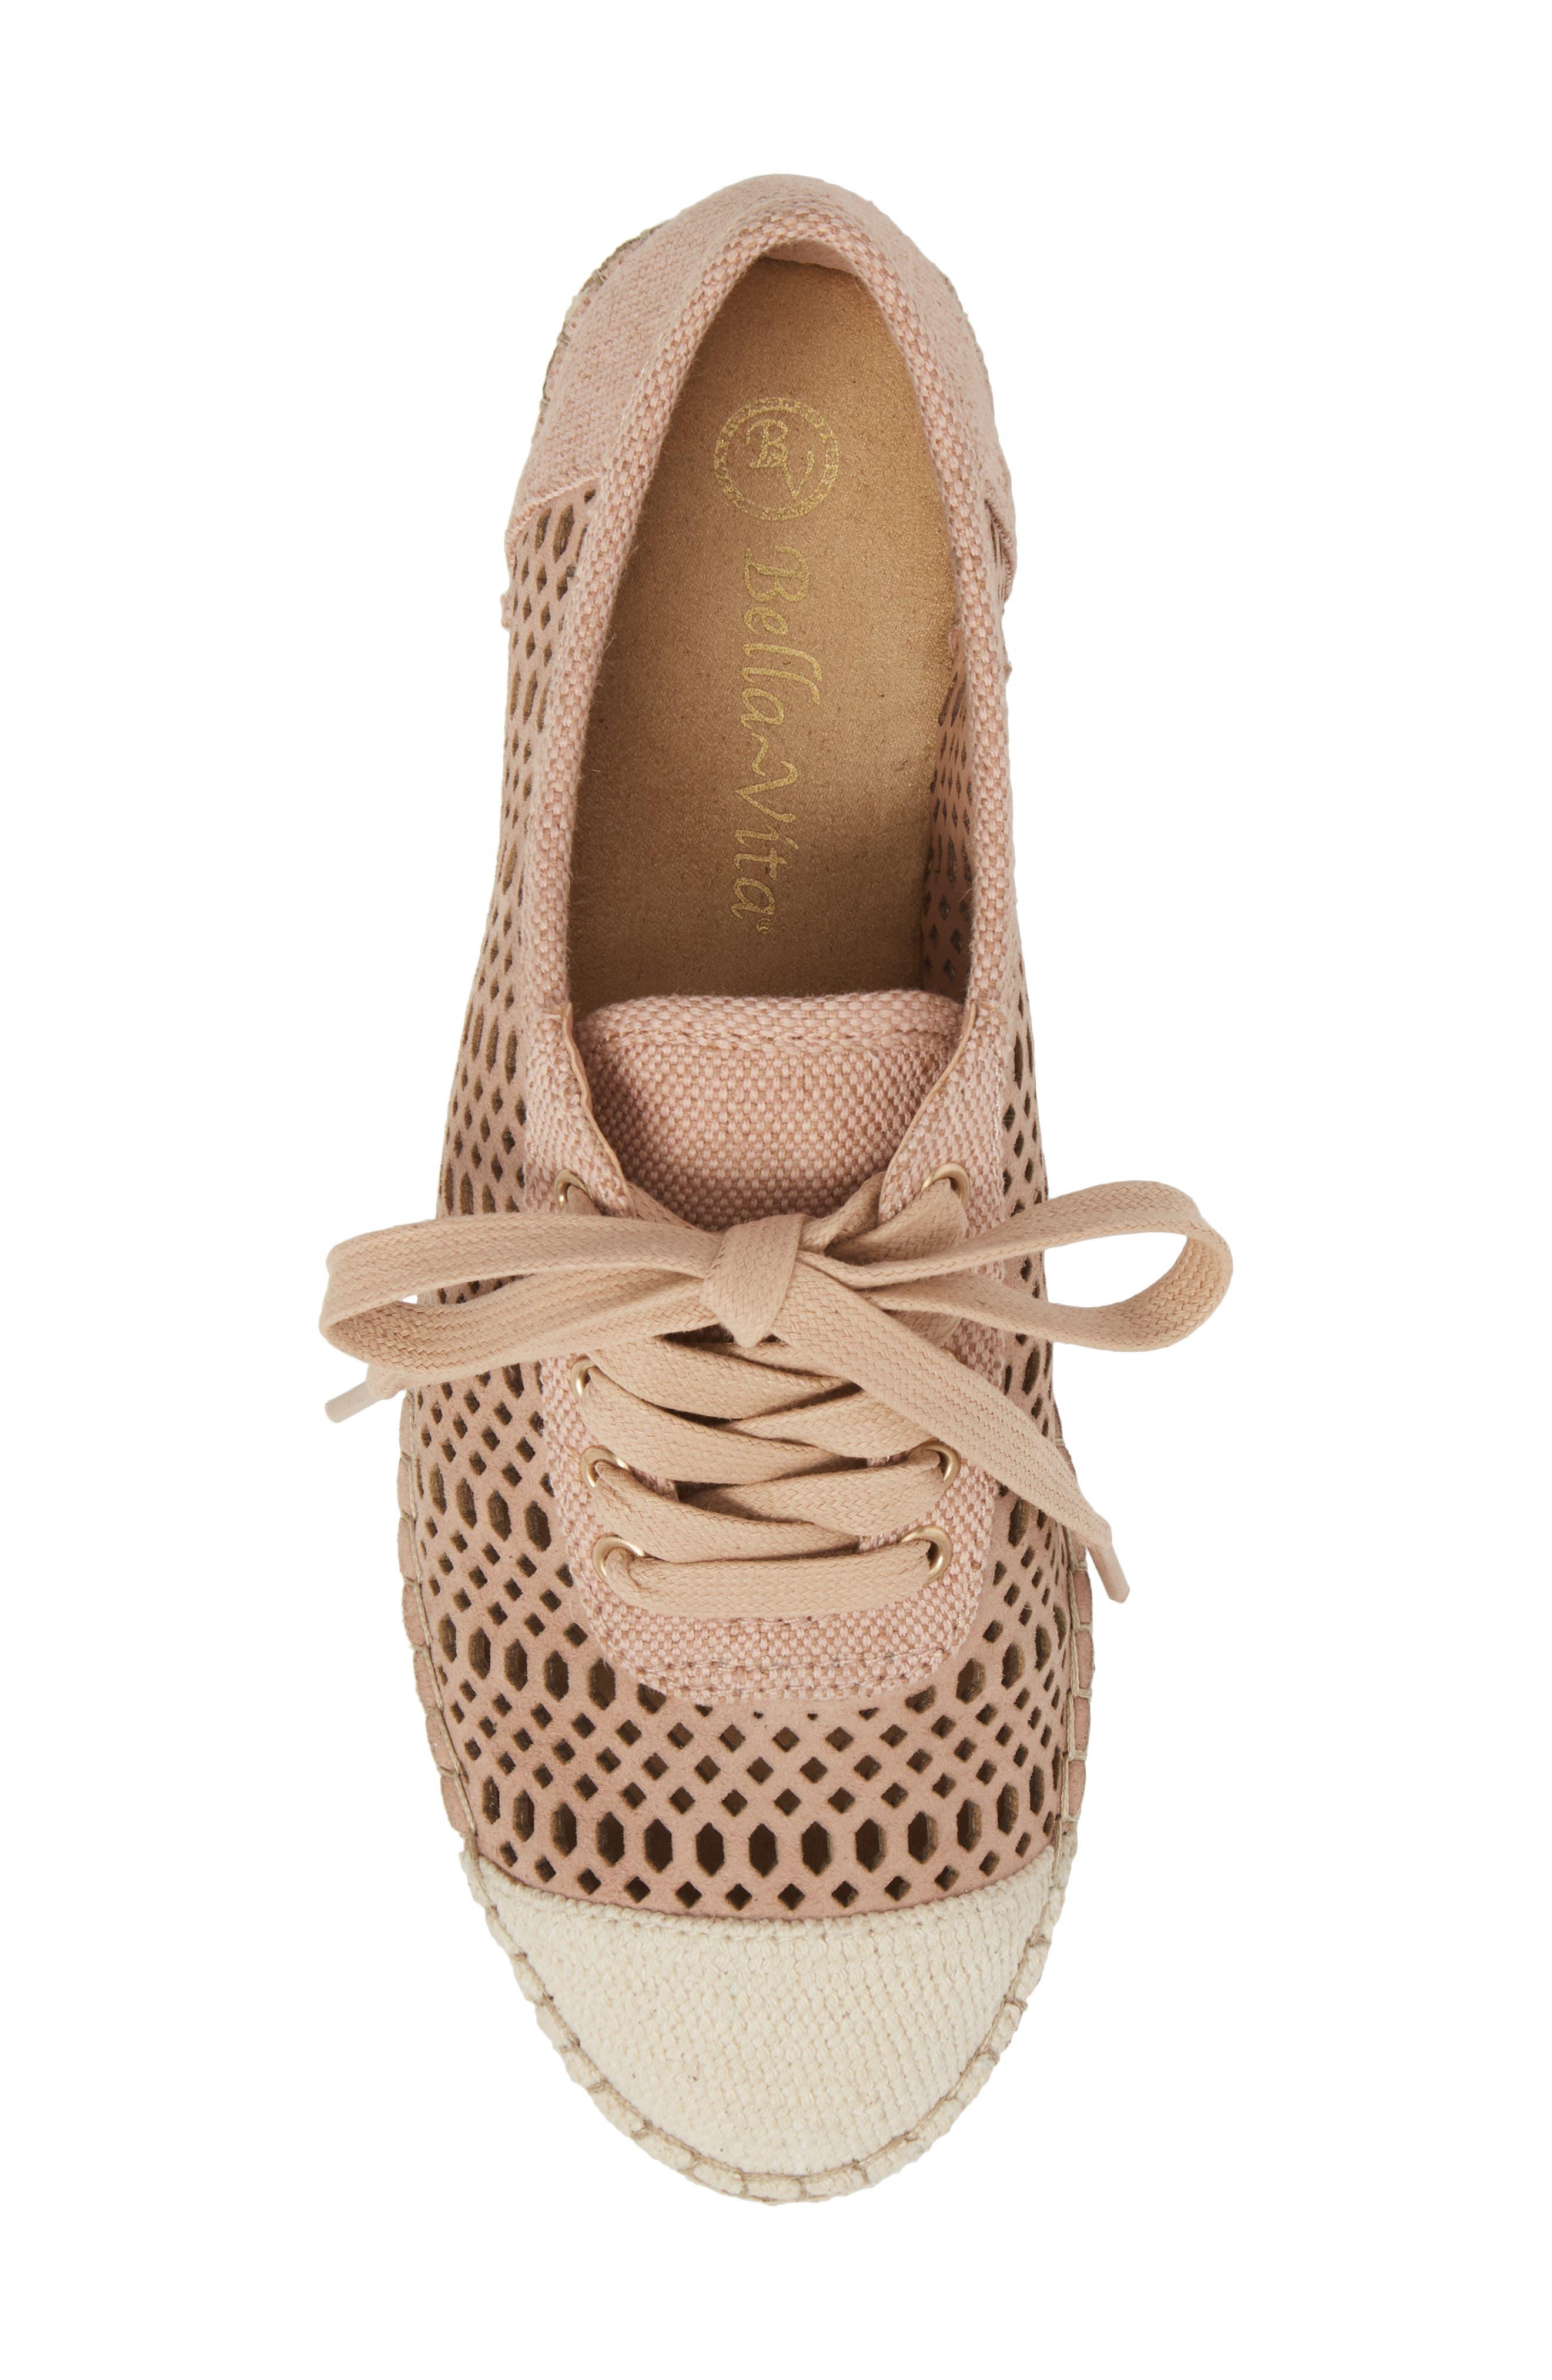 Clementine Espadrille Sneaker,                             Alternate thumbnail 5, color,                             Blush Suede